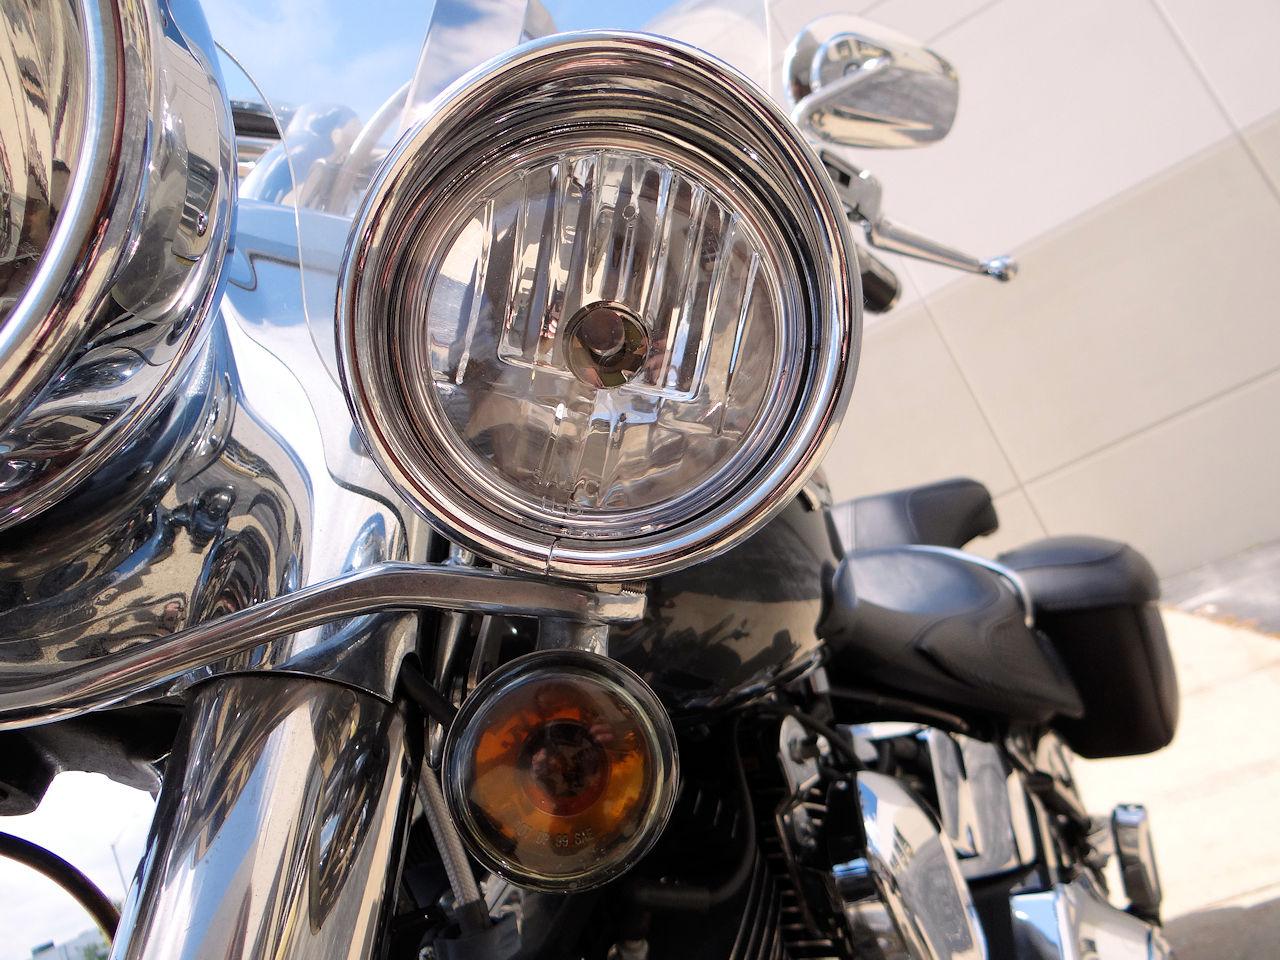 2006 Harley Davidson FLSTNI 58